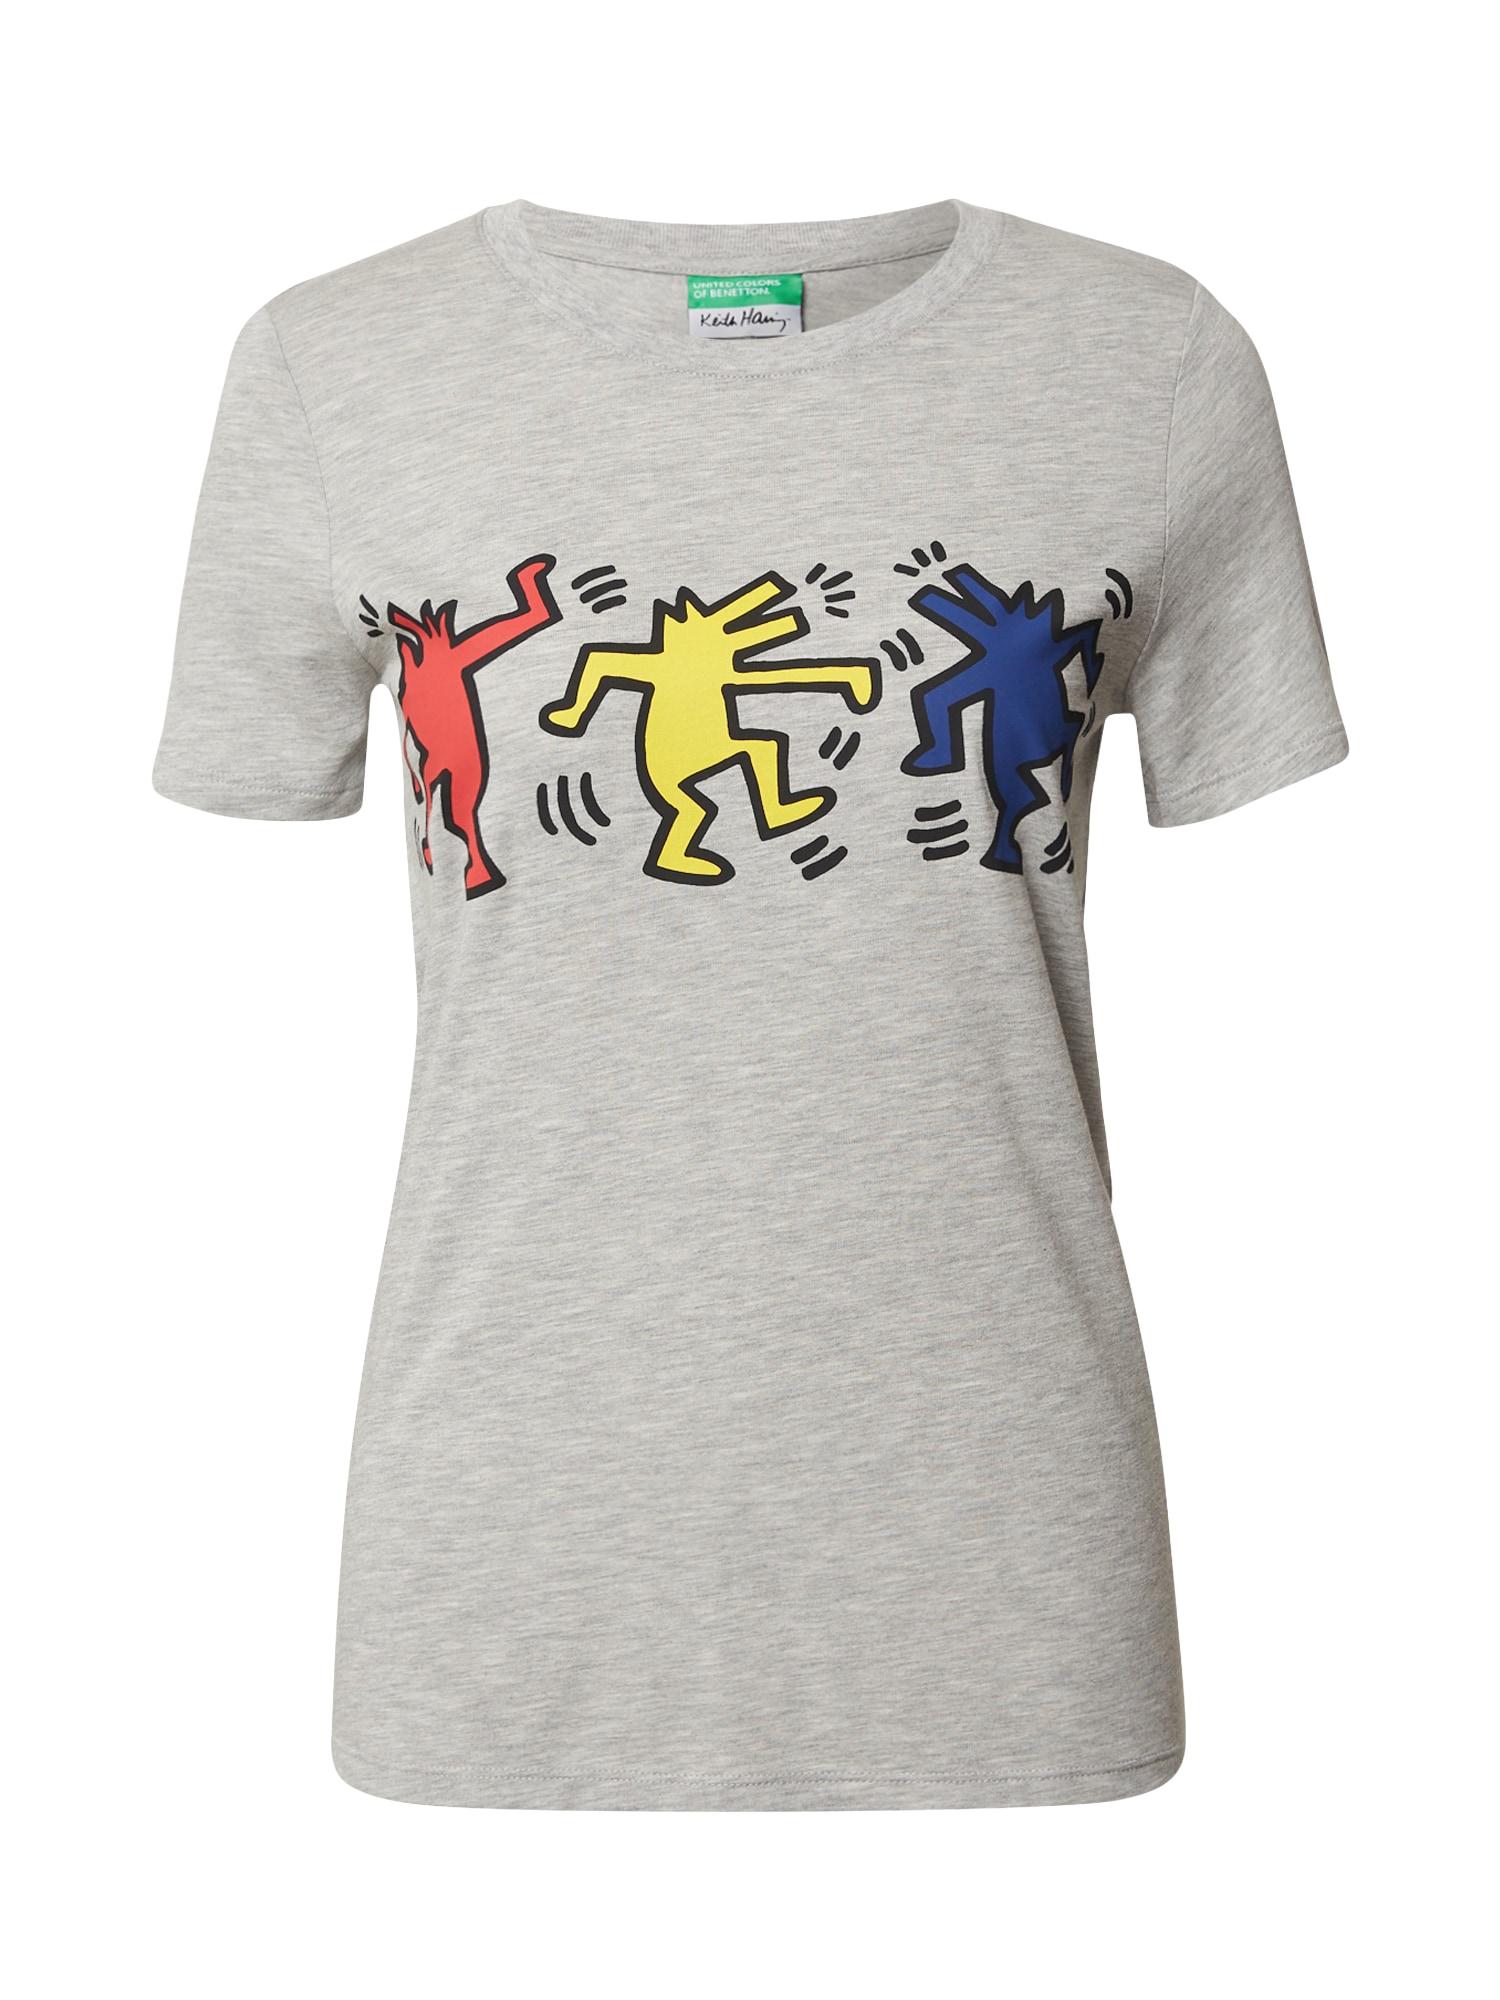 UNITED COLORS OF BENETTON Tričko  šedý melír / žlutá / červená / modrá